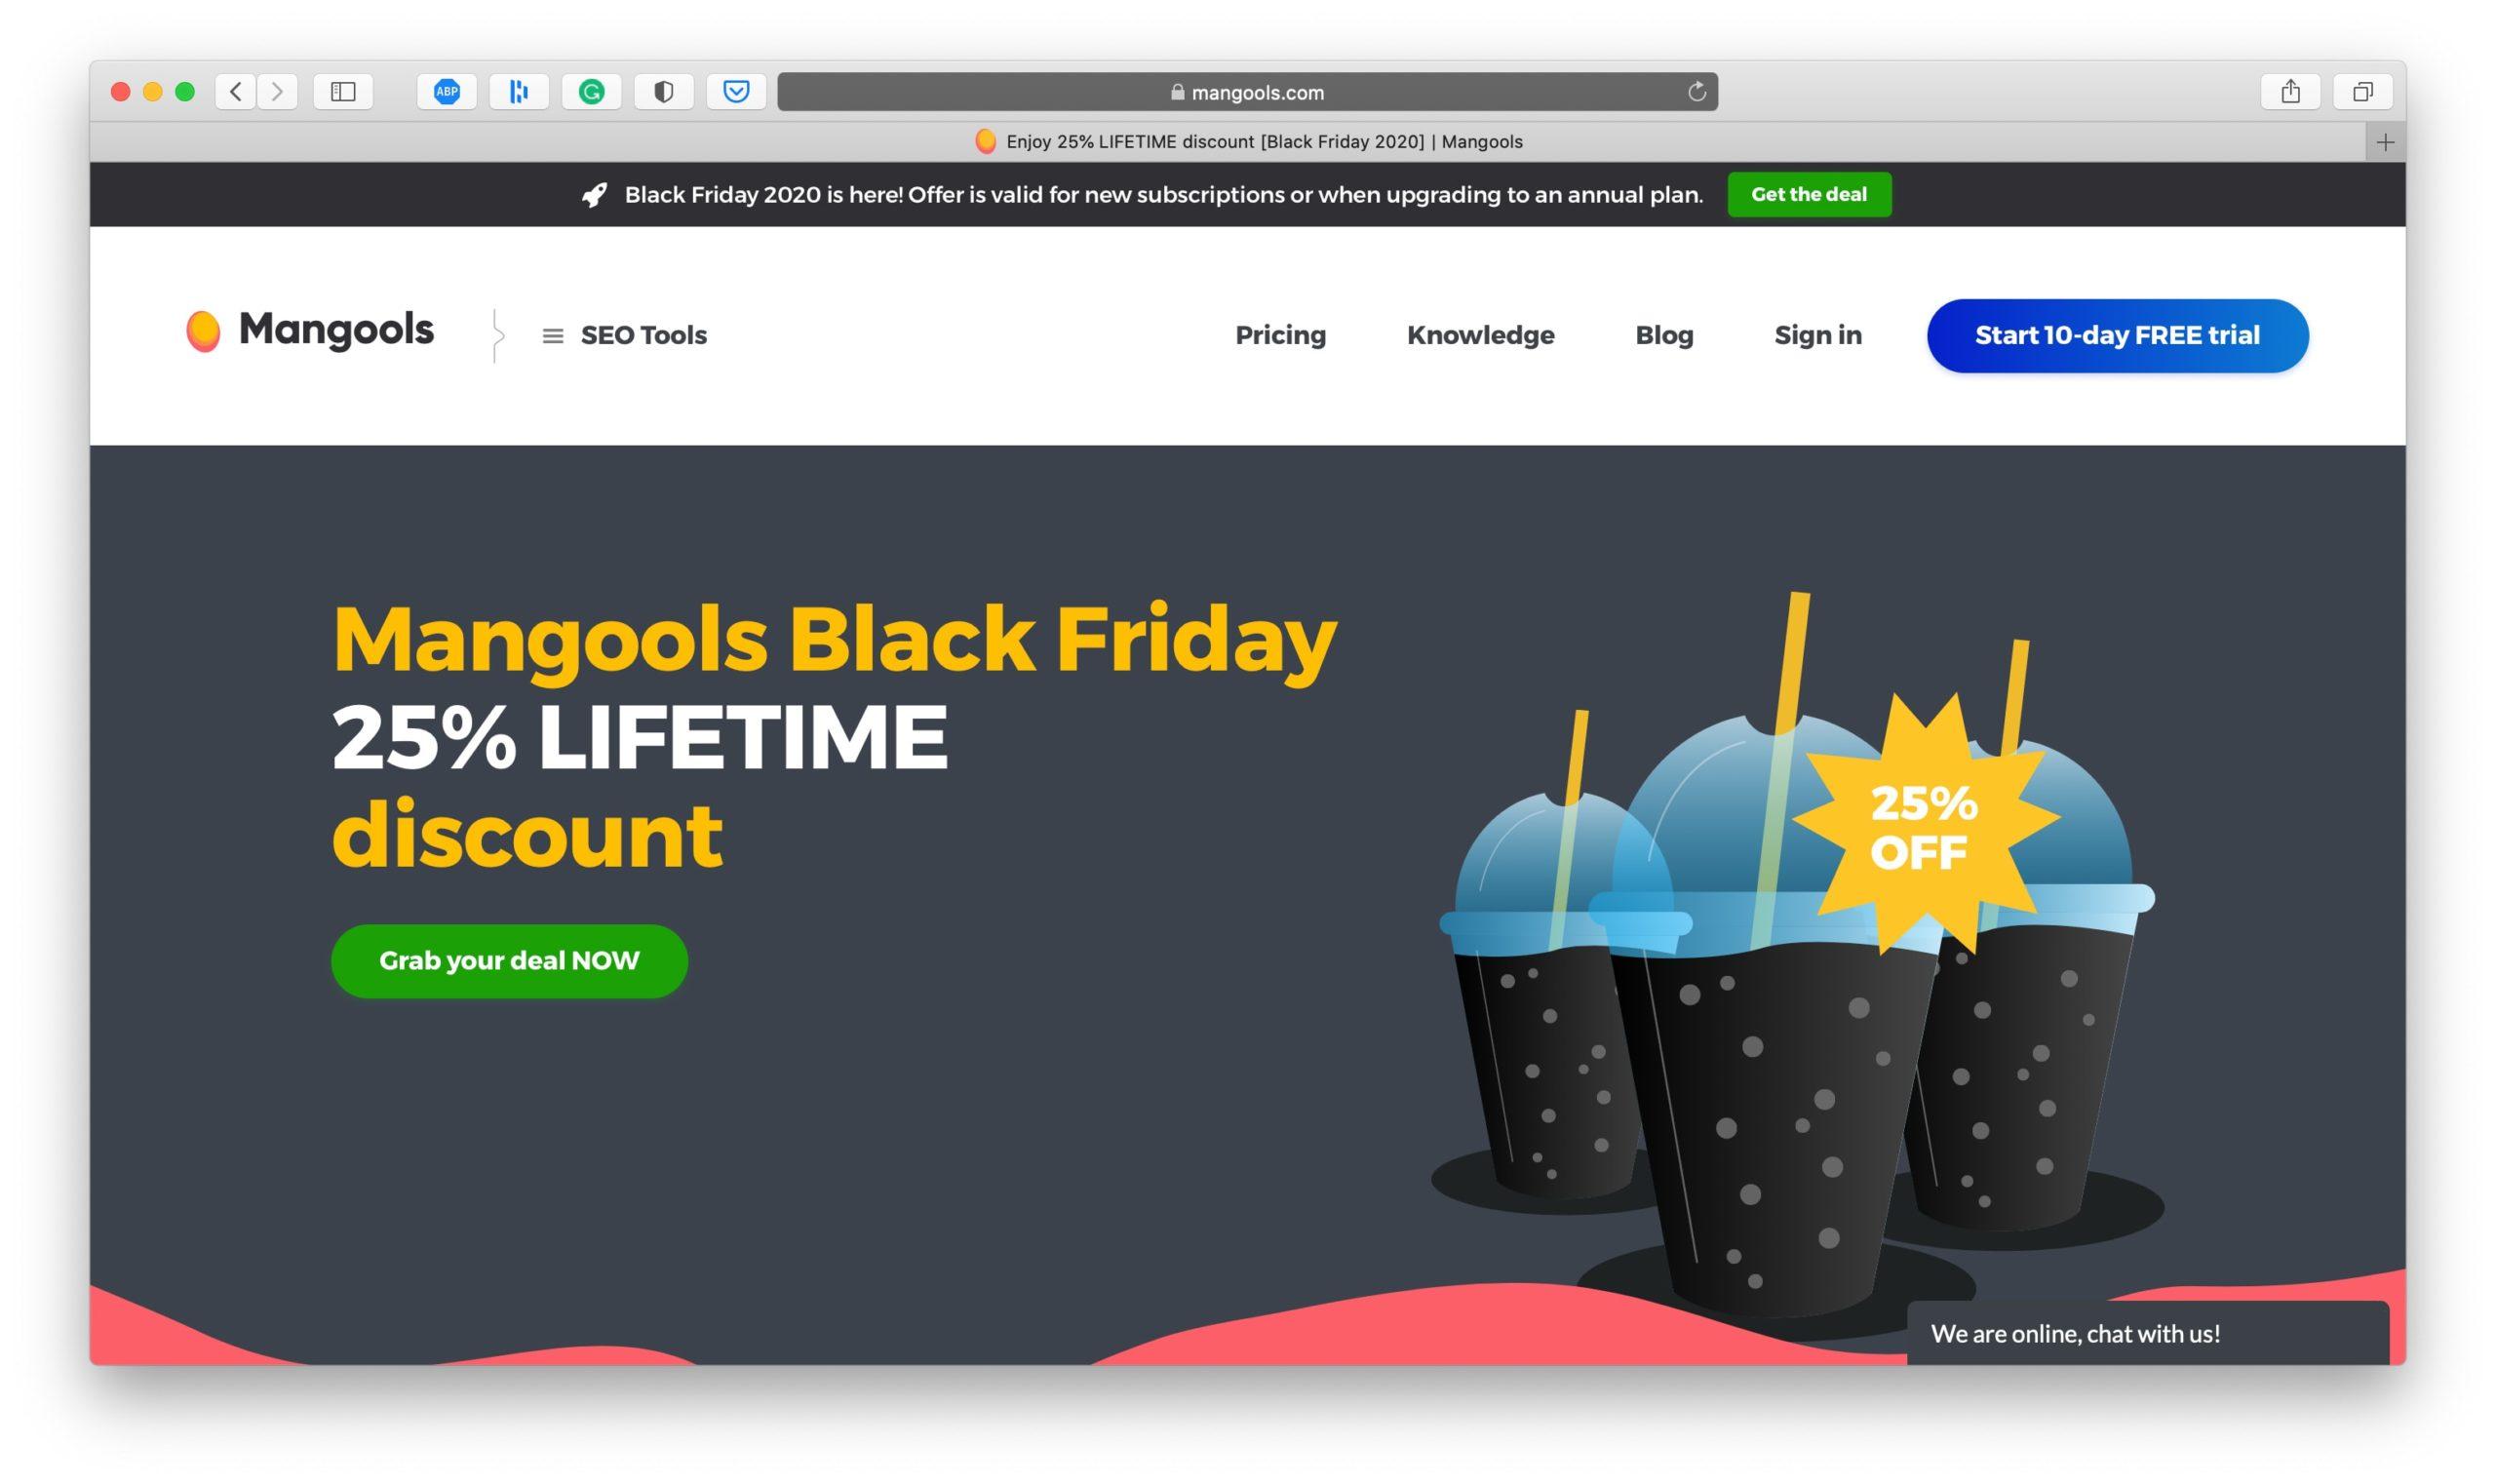 Mangools Black Friday Deal